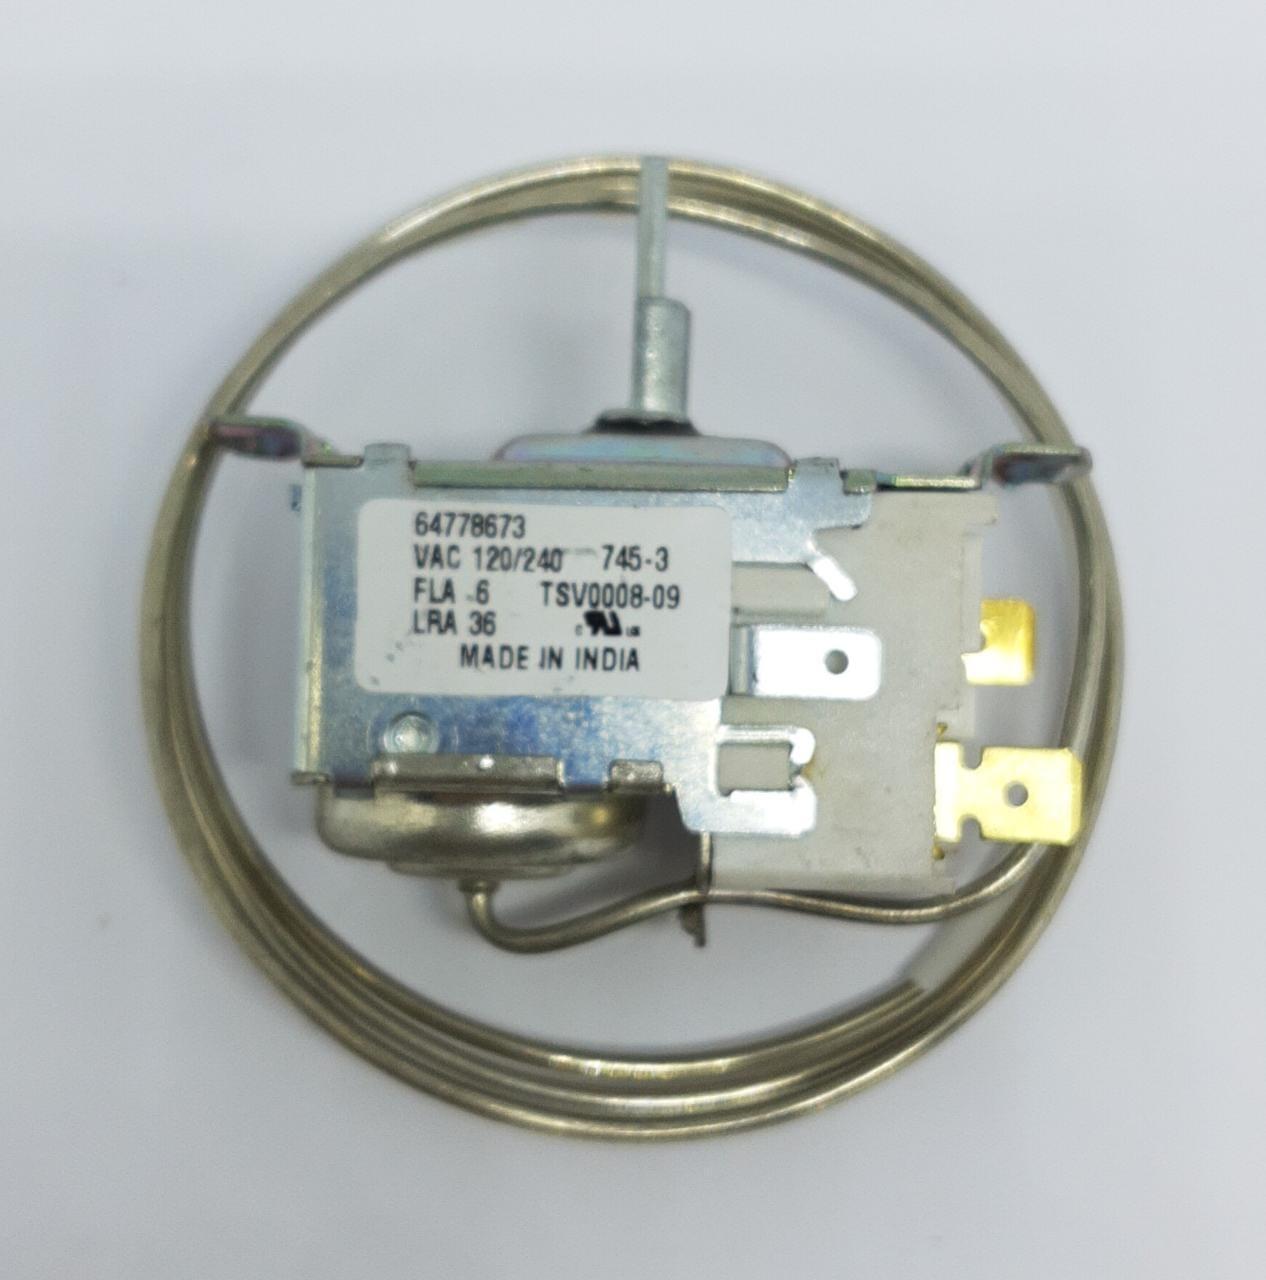 Termostato Electrolux Re29 Tsv0008-09 64778673